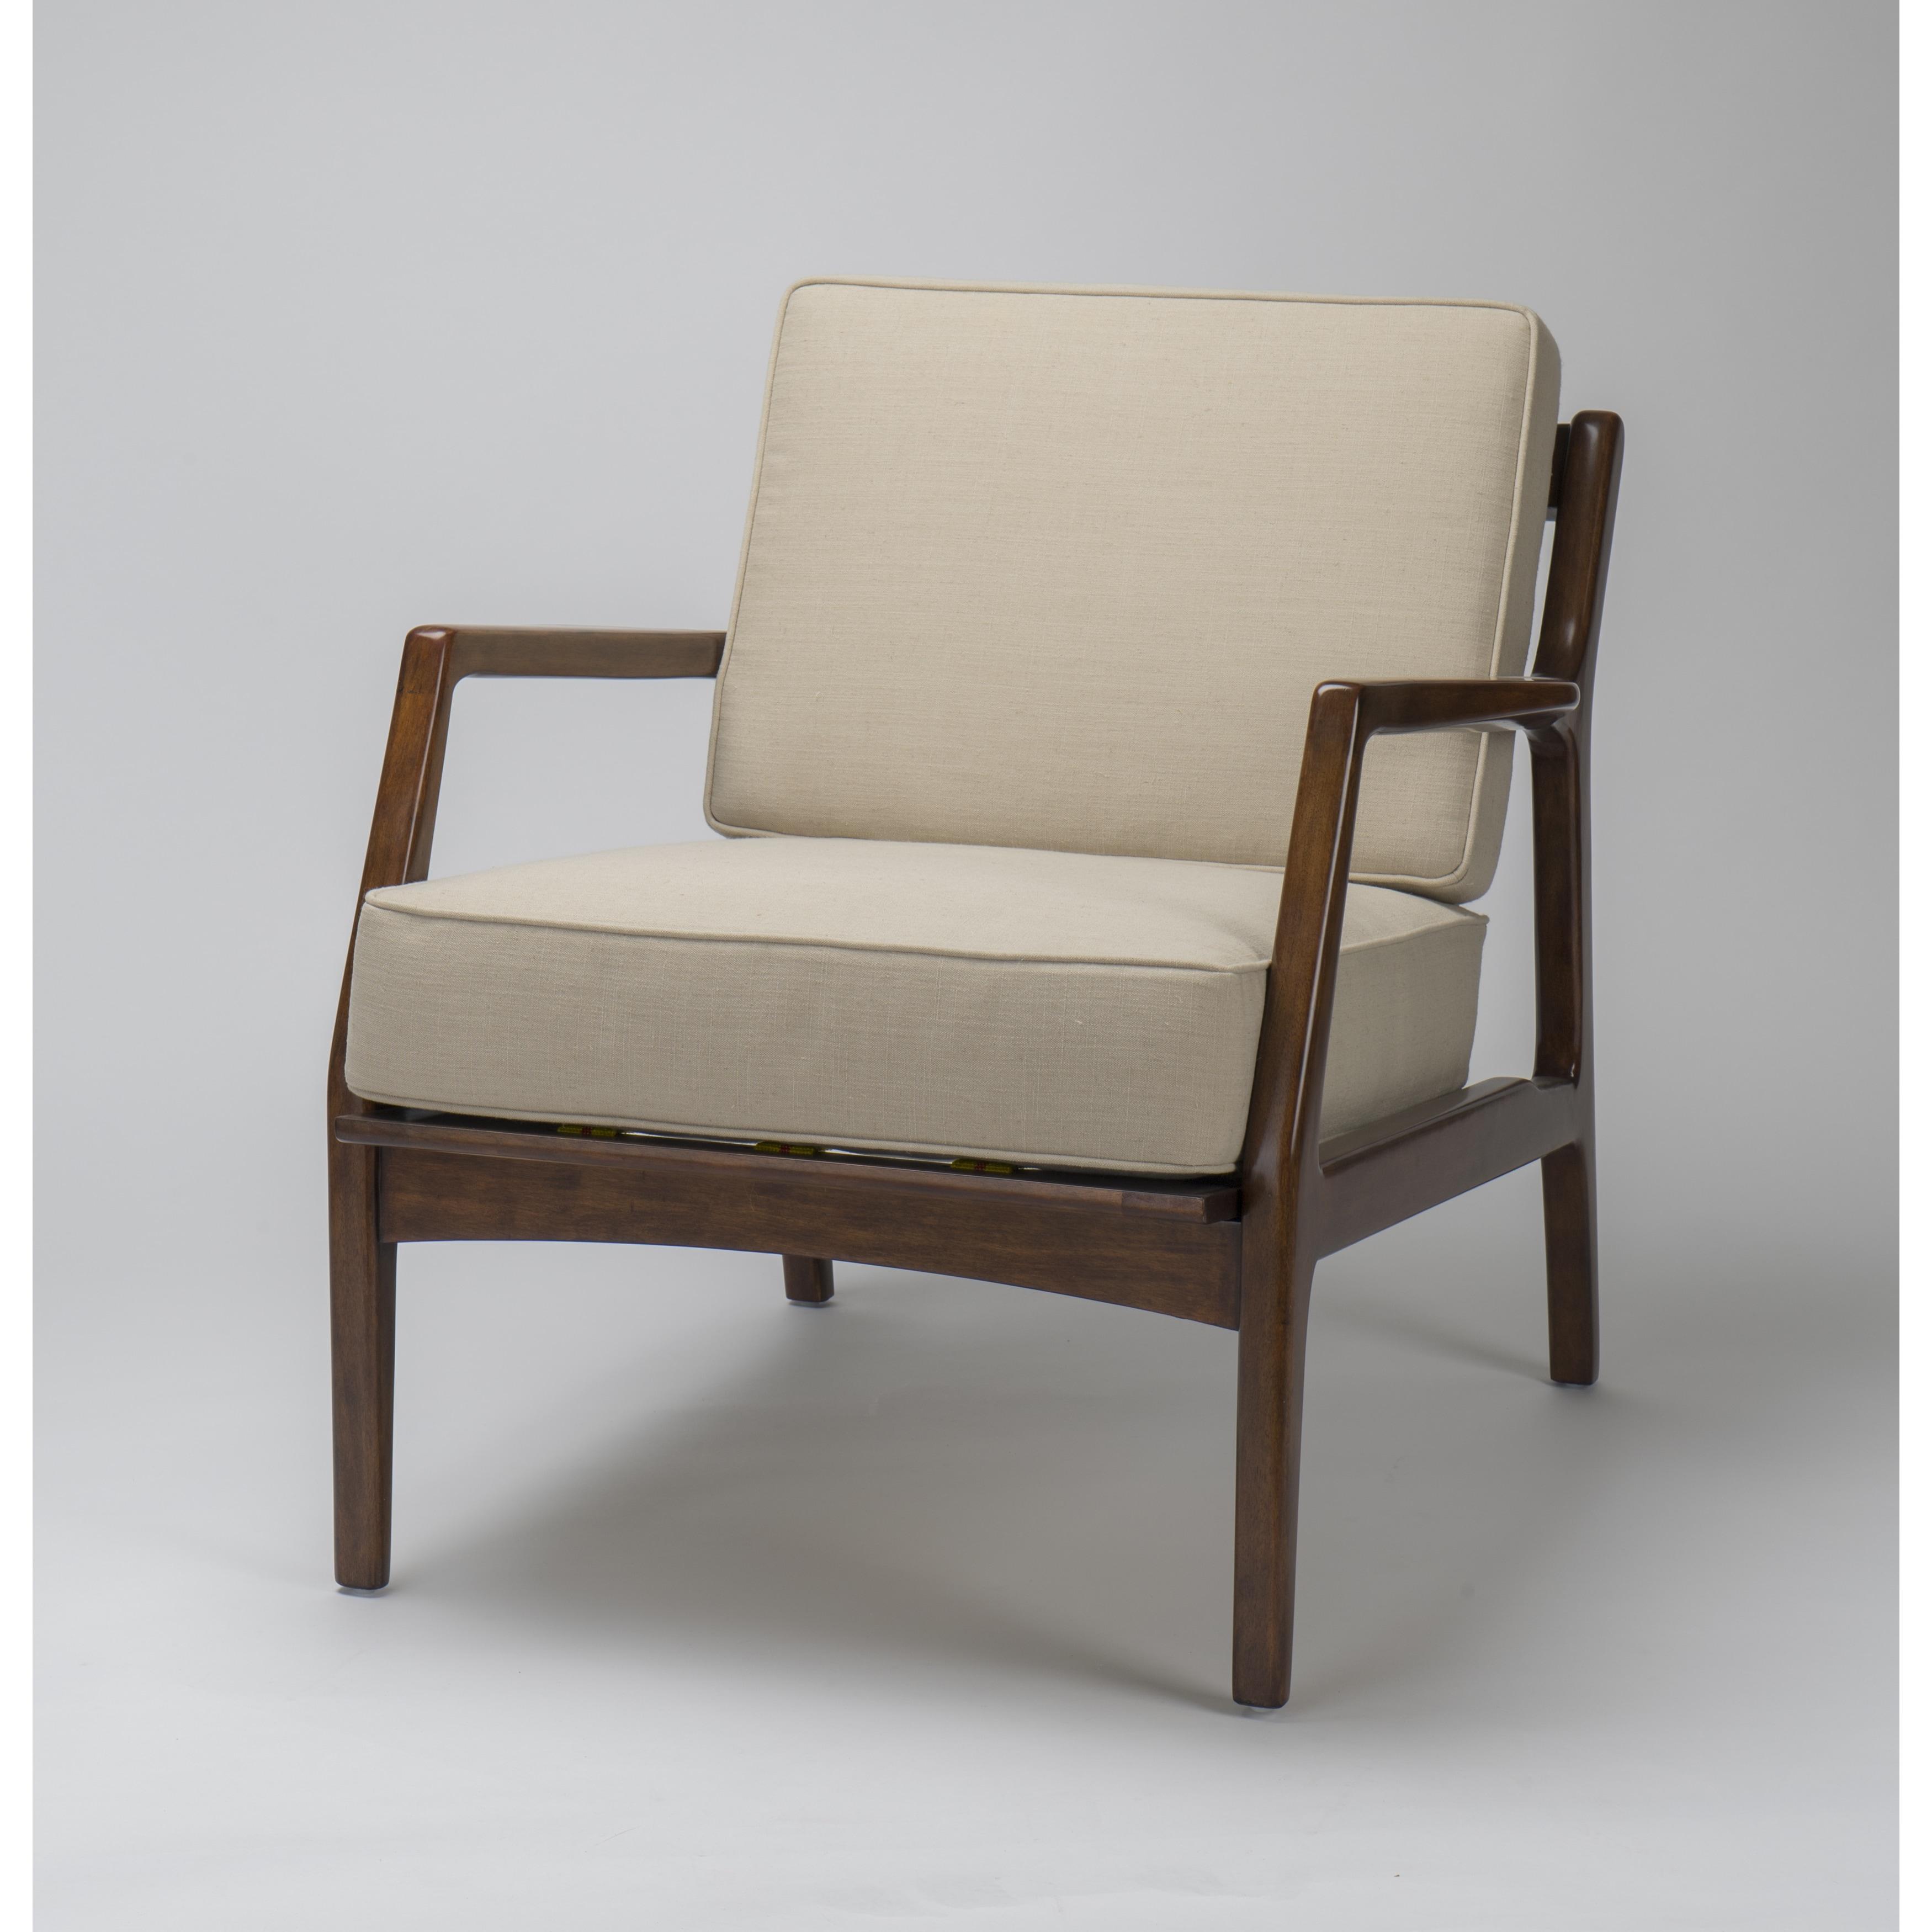 Veurne Mid-century Modern Cream Accent Chair (VEURNE CHAIR)